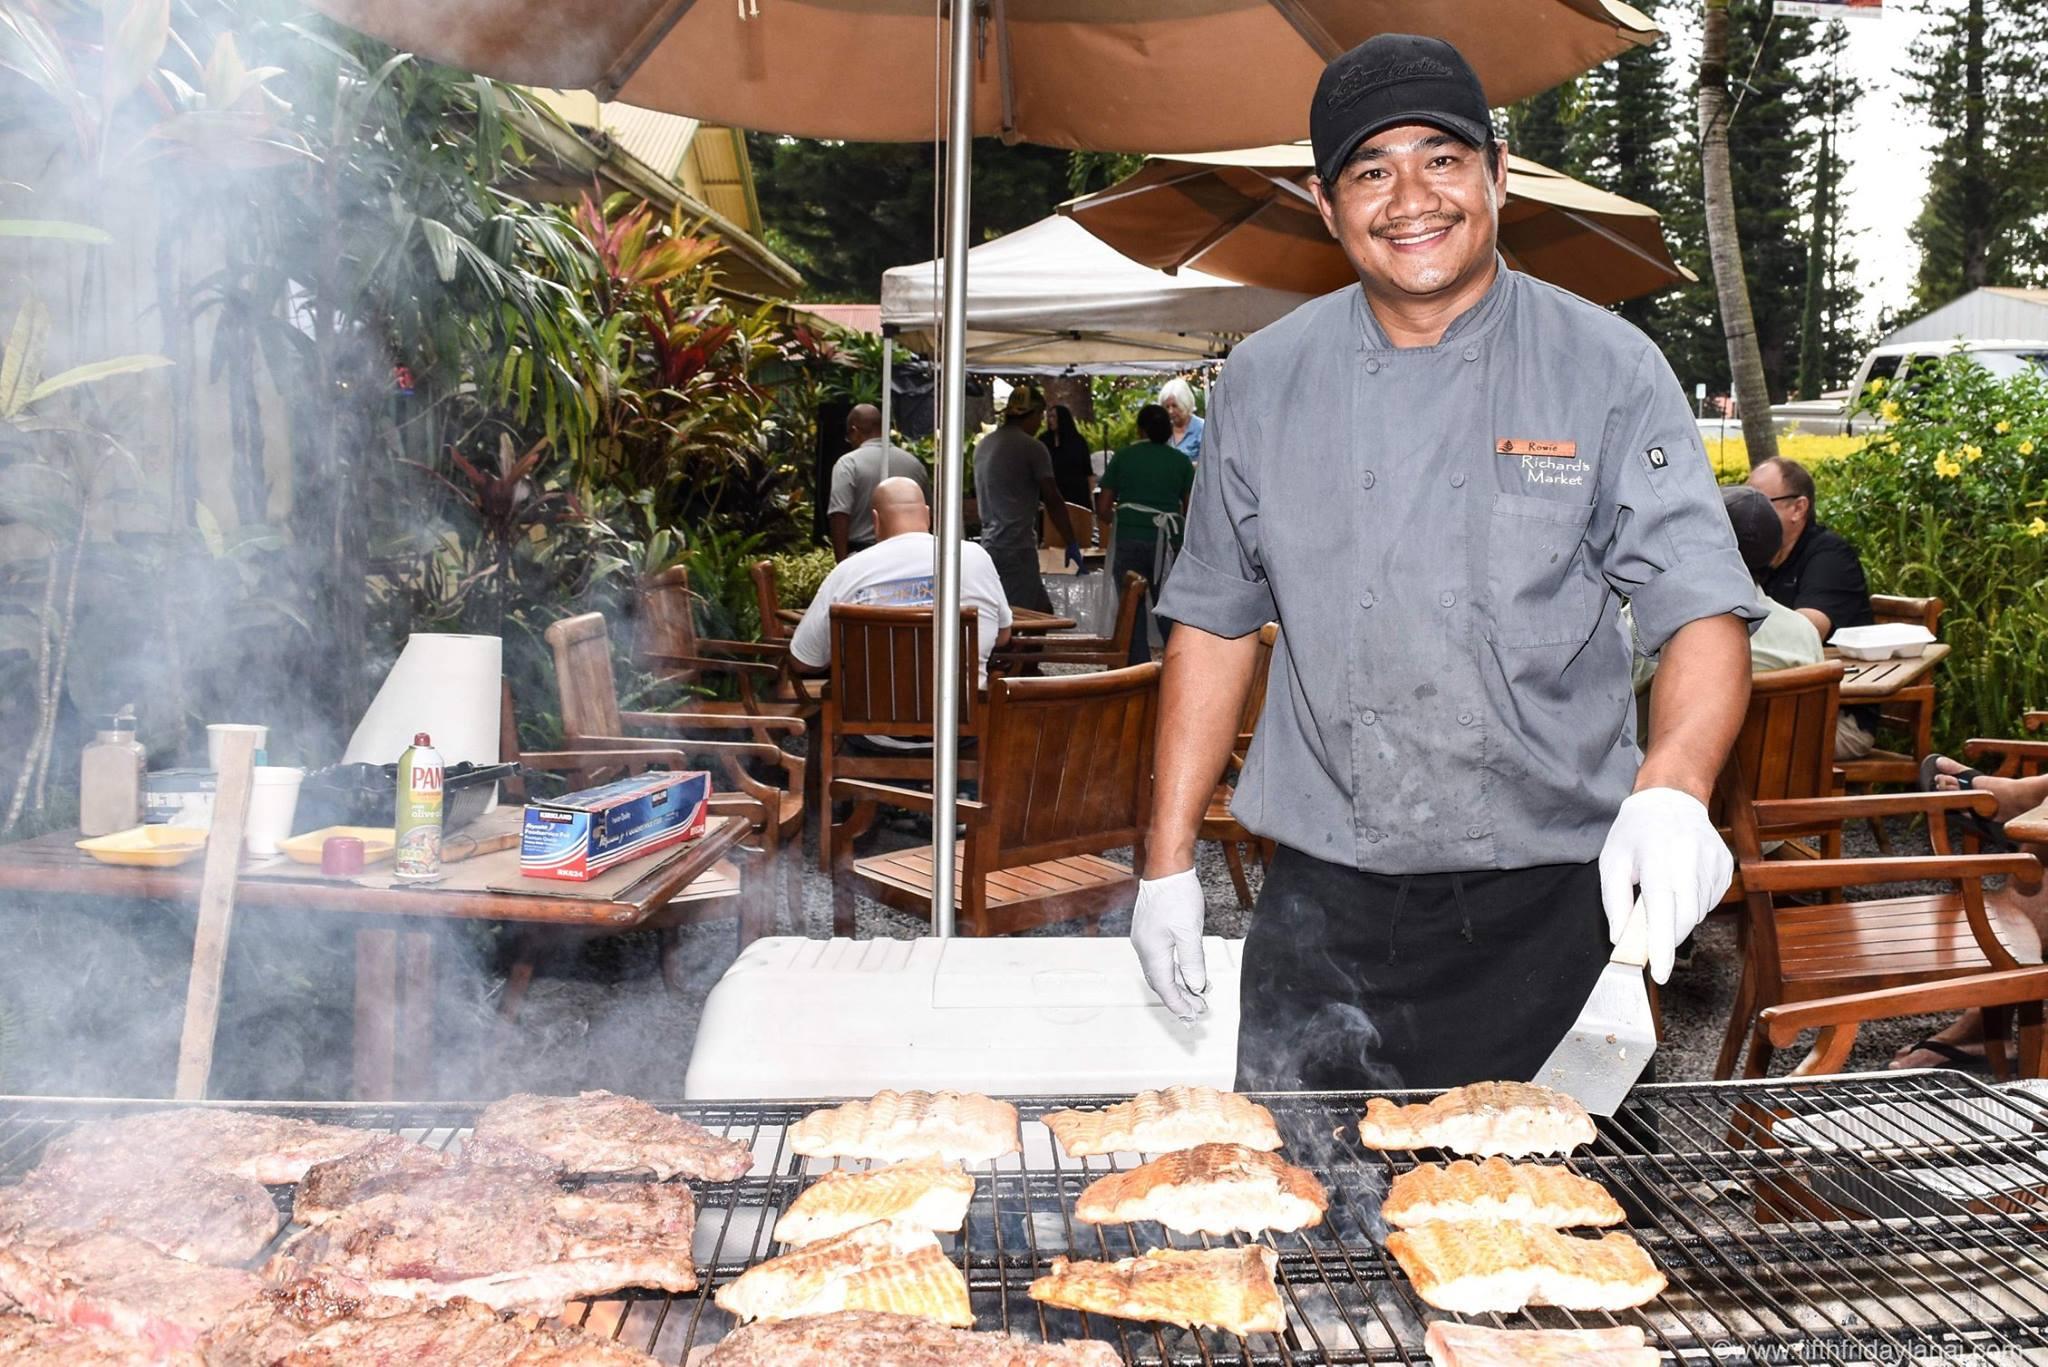 Lanai Fifth Friday Celebration Maui Hawaii